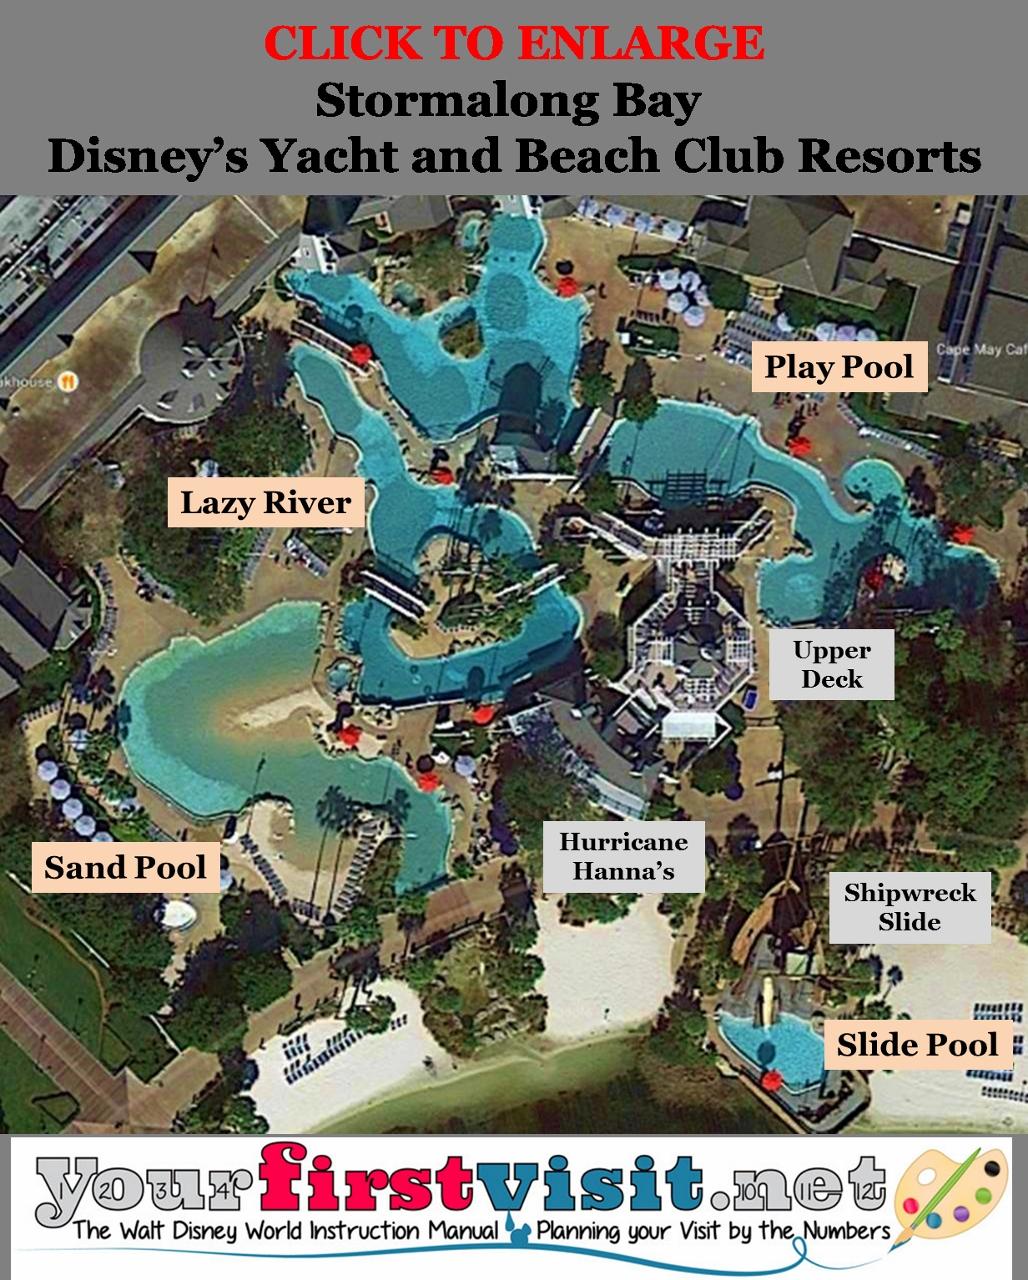 Stormalong Bay At Disney S Yacht And Beach Club Resorts